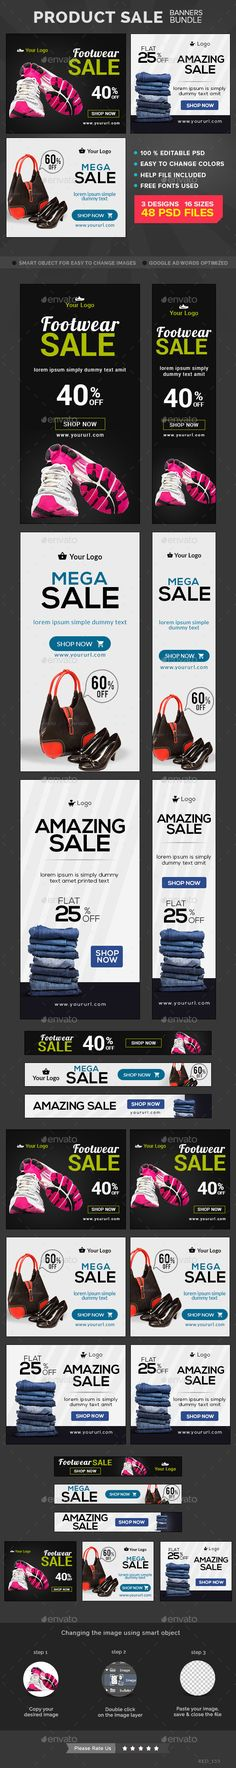 Product Sale Banners Bundle Templates #design Download: http://graphicriver.net/item/product-sale-banners-bundle/11342239?ref=ksioks